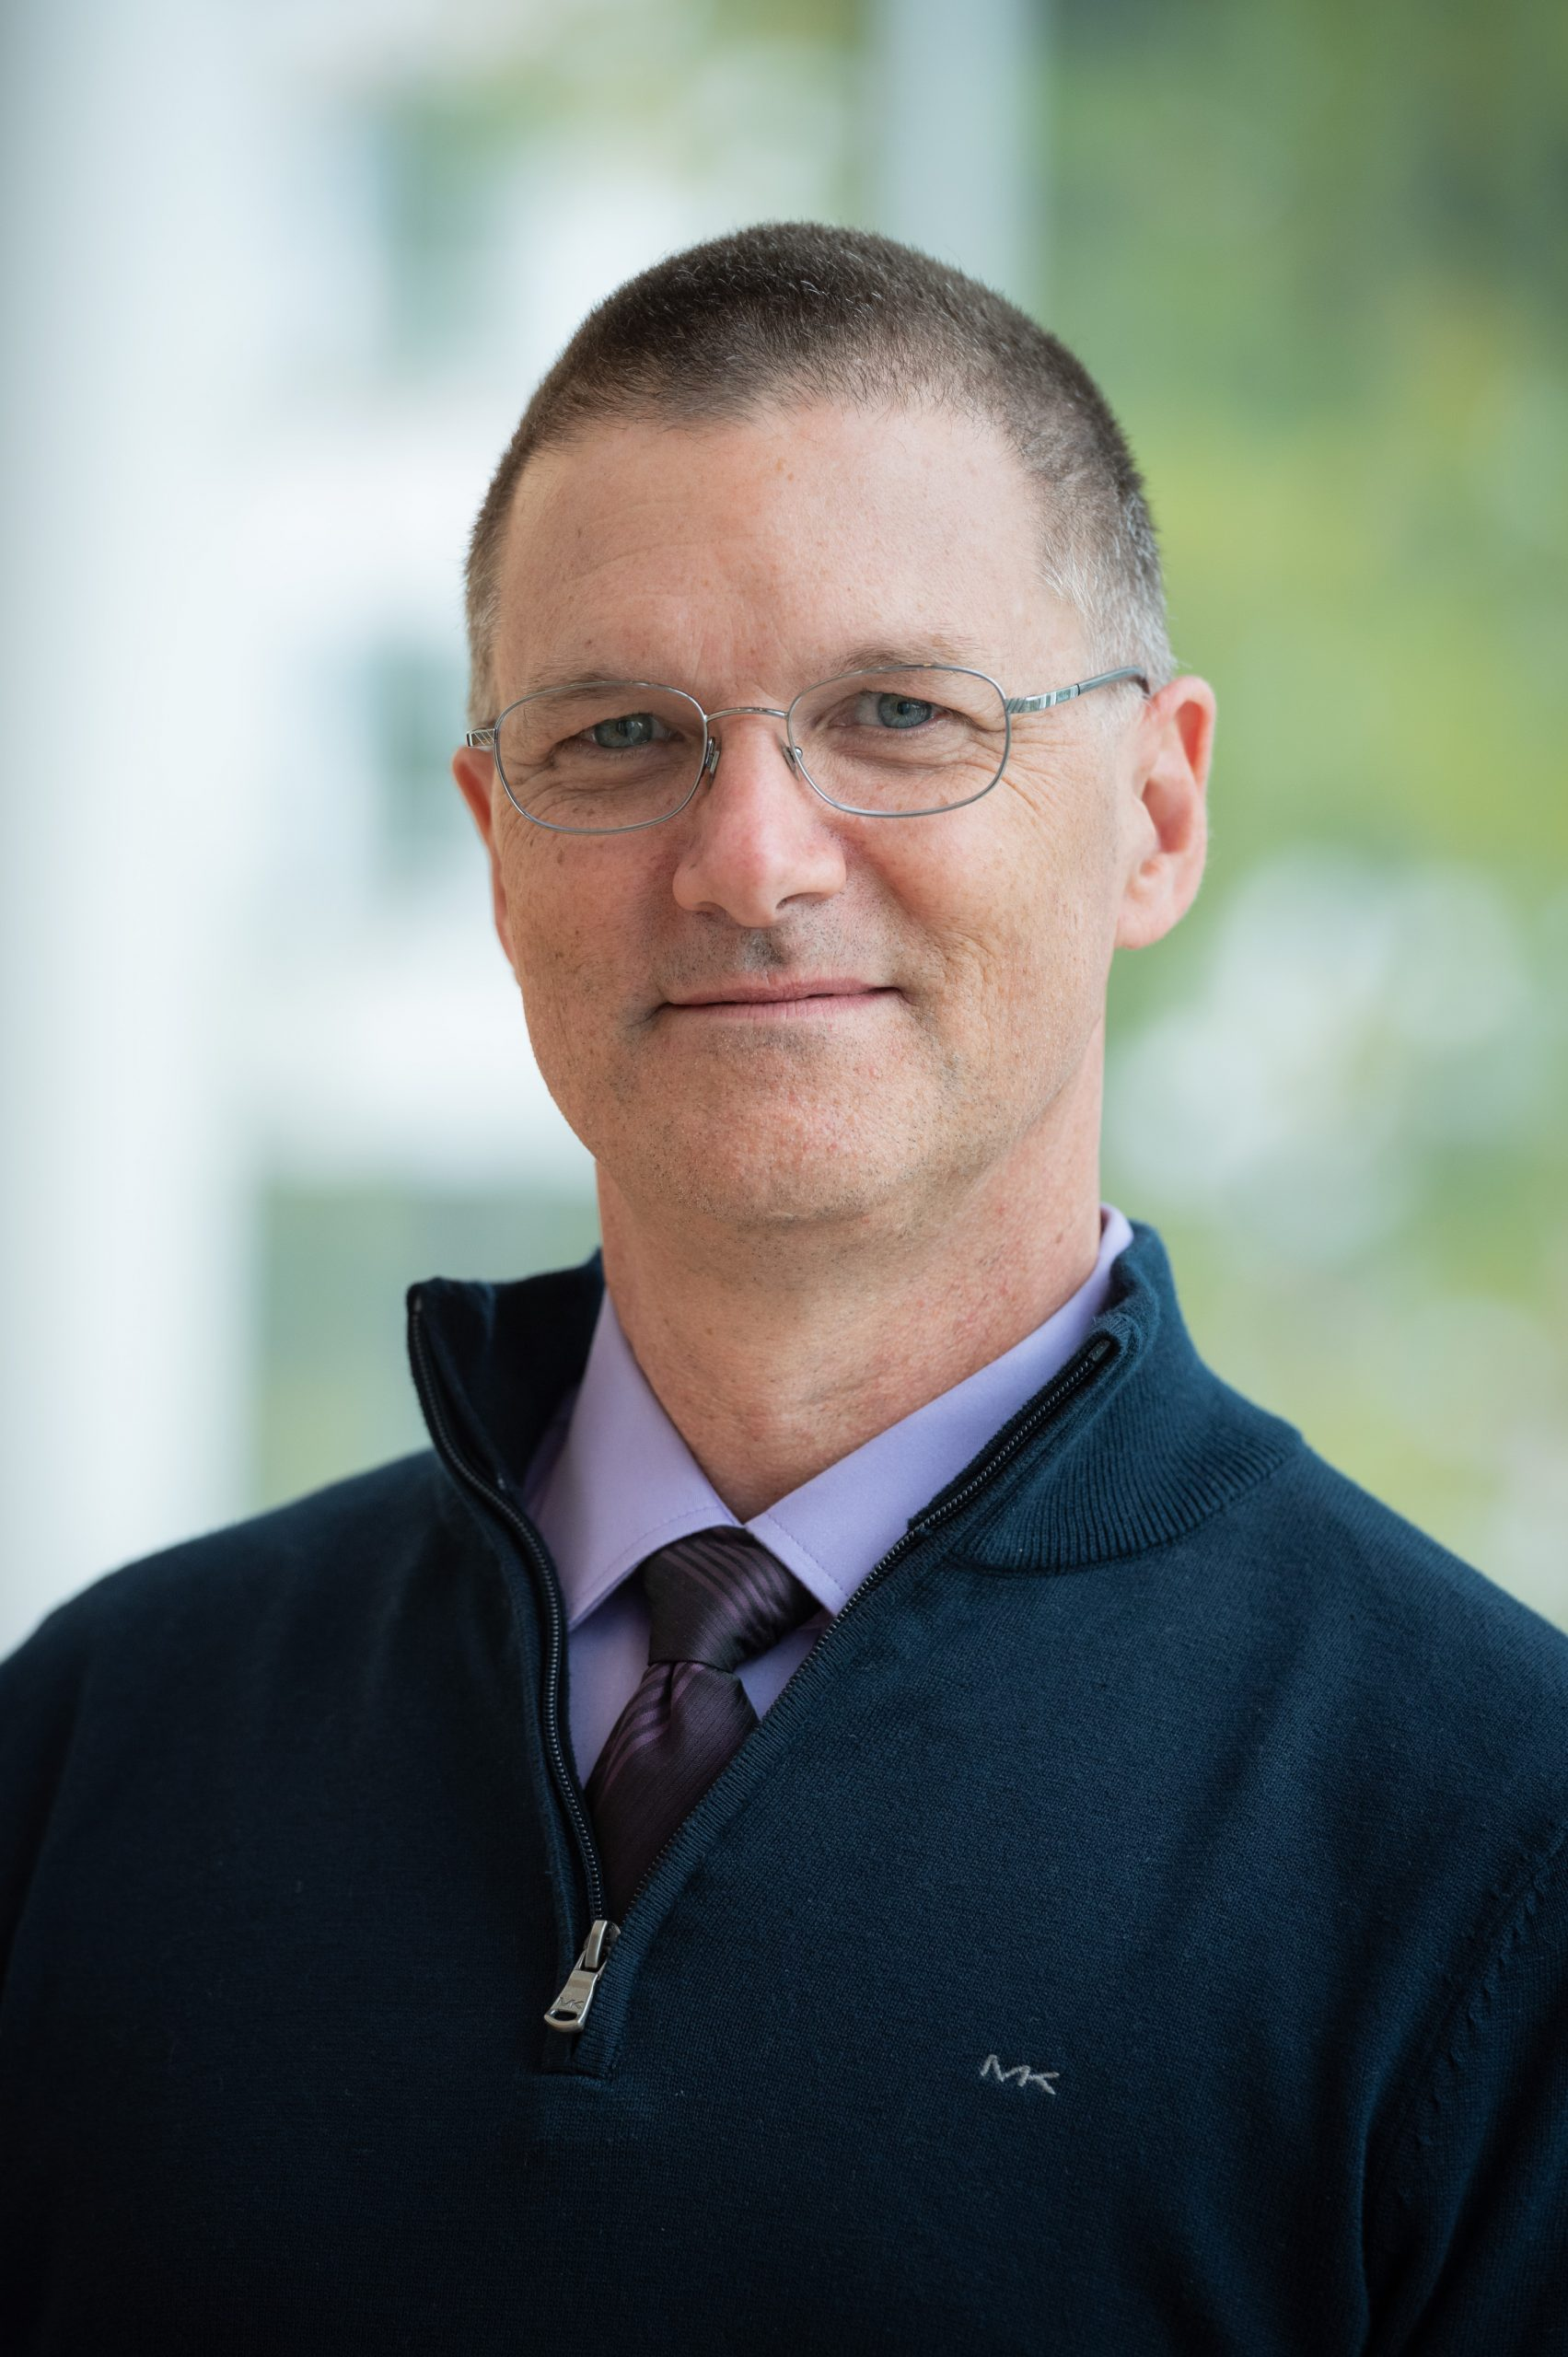 Dr. Glenn Regehr